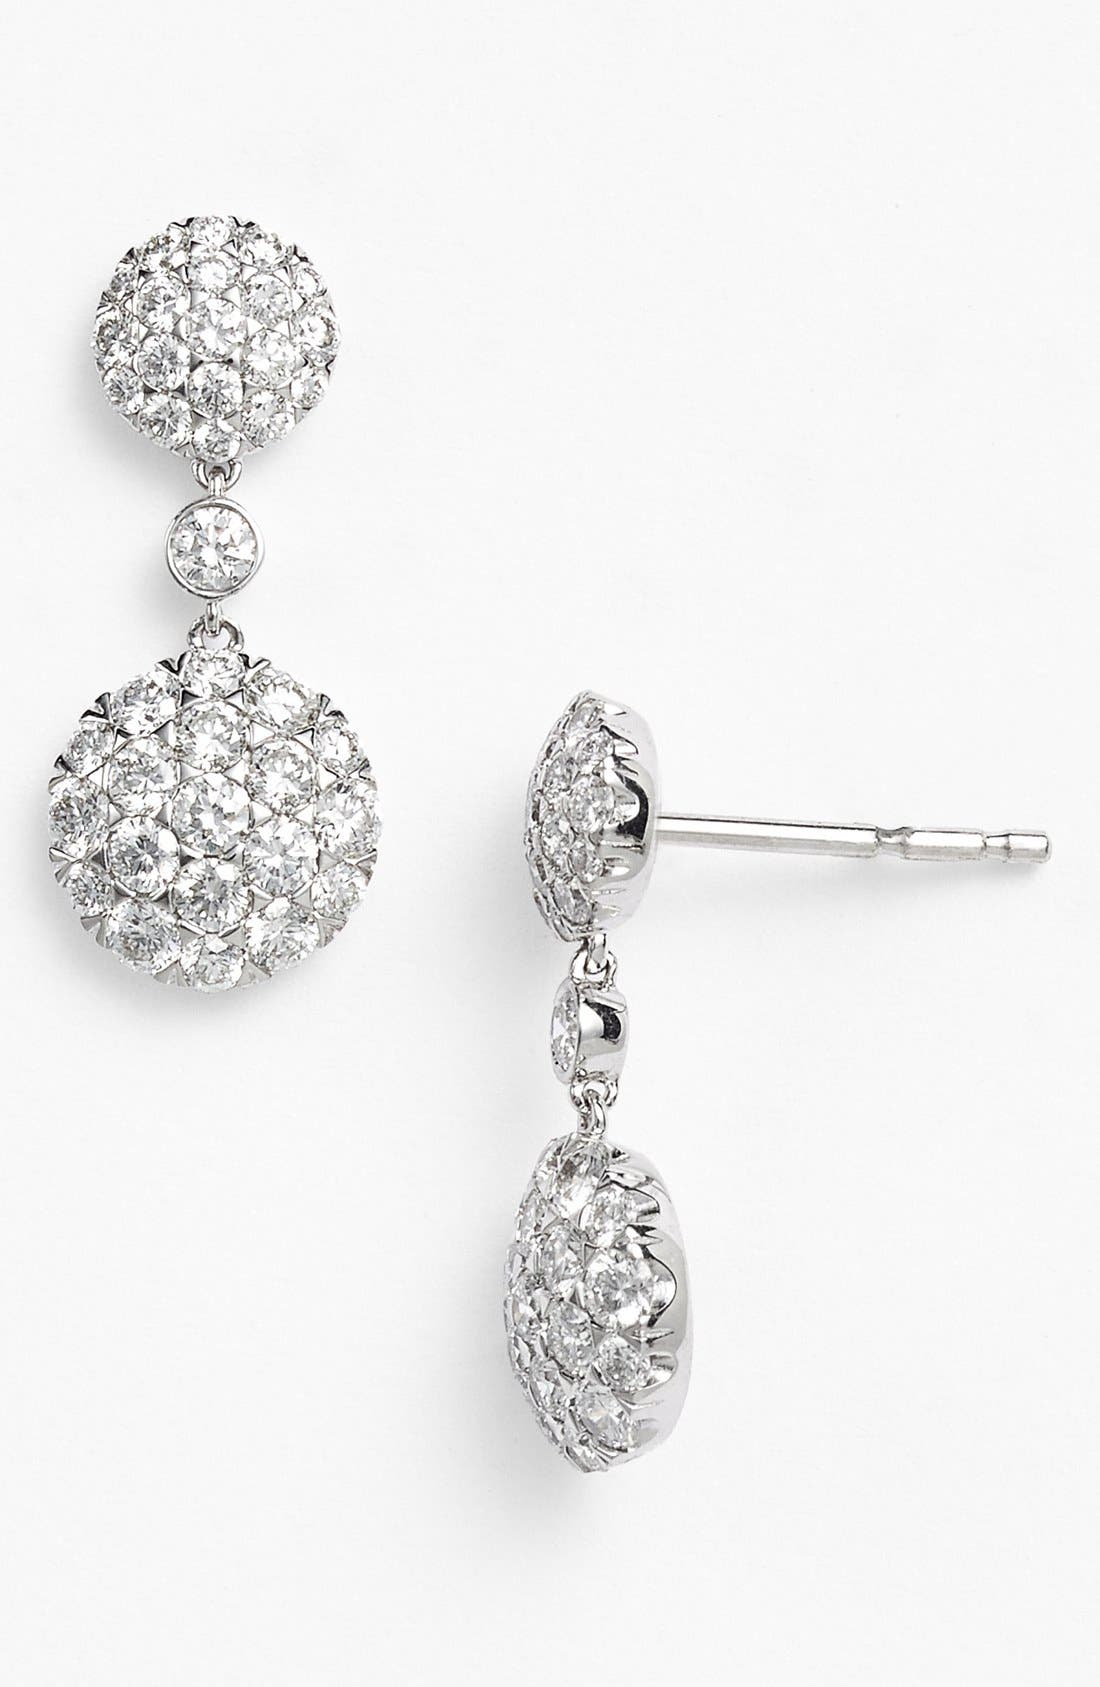 Main Image - Kwiat 'Moonrise' Diamond Drop Earrings